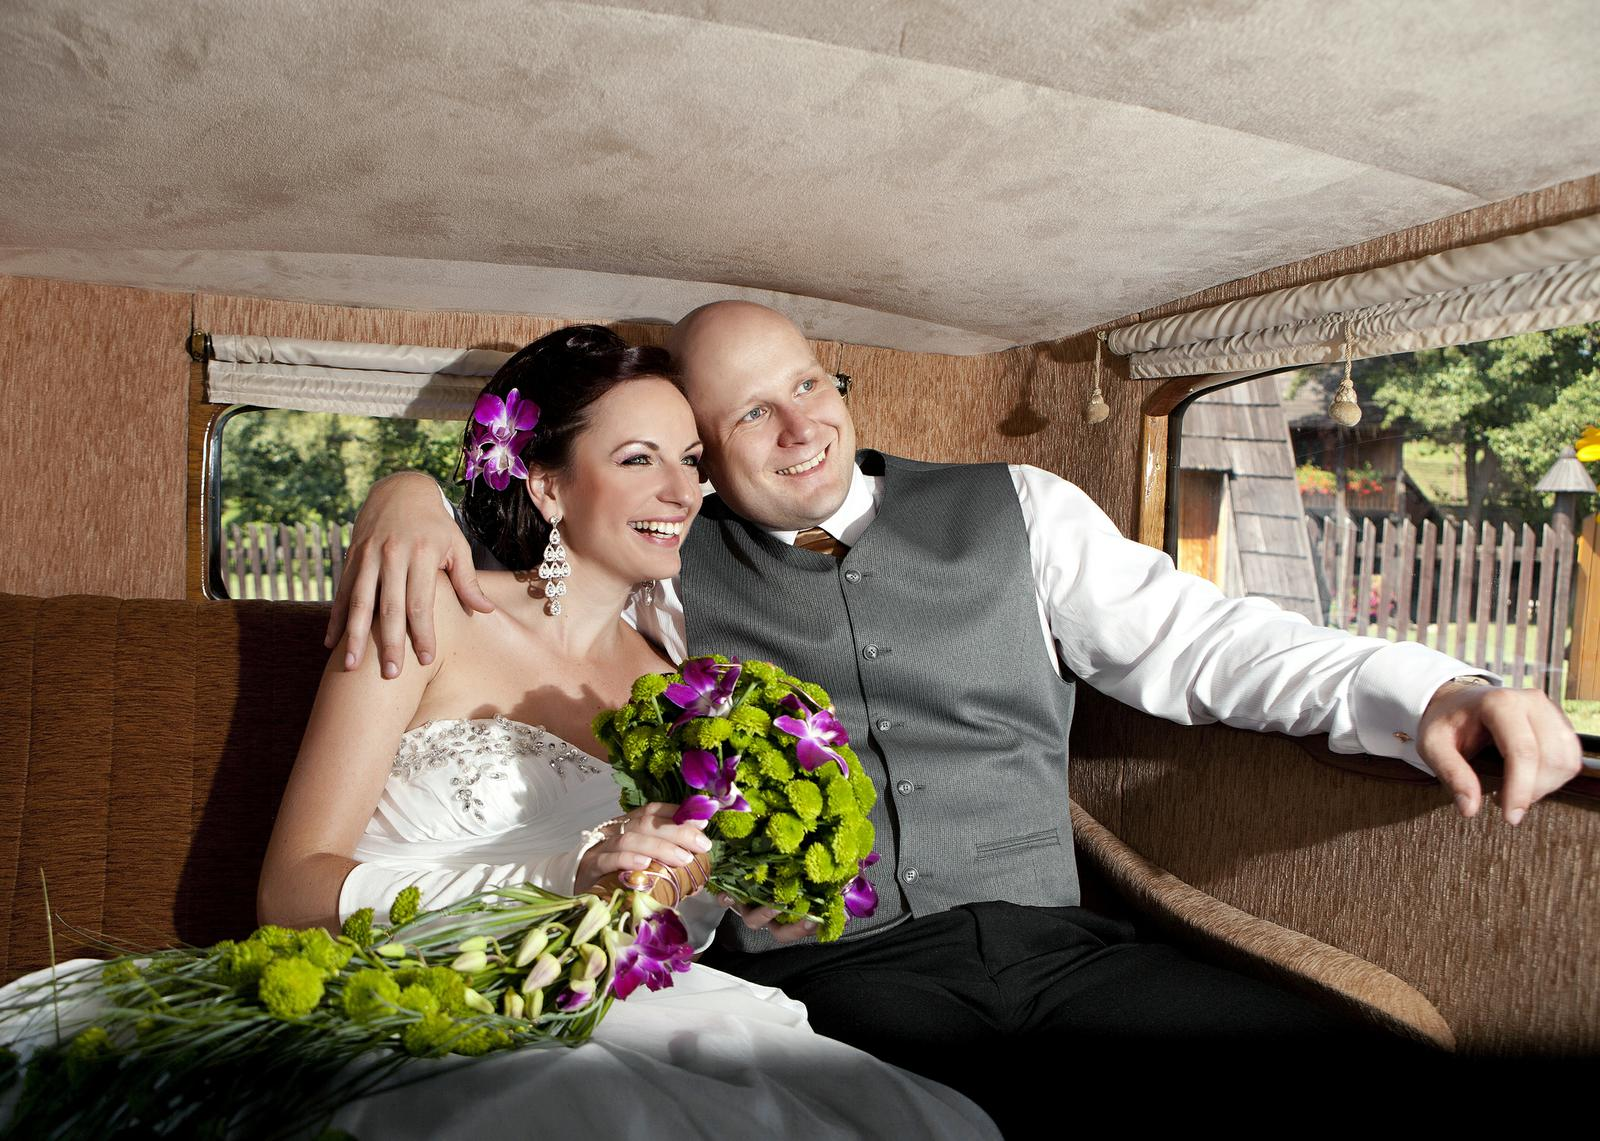 Svadba M&M 2.9.2012 - Obrázok č. 1